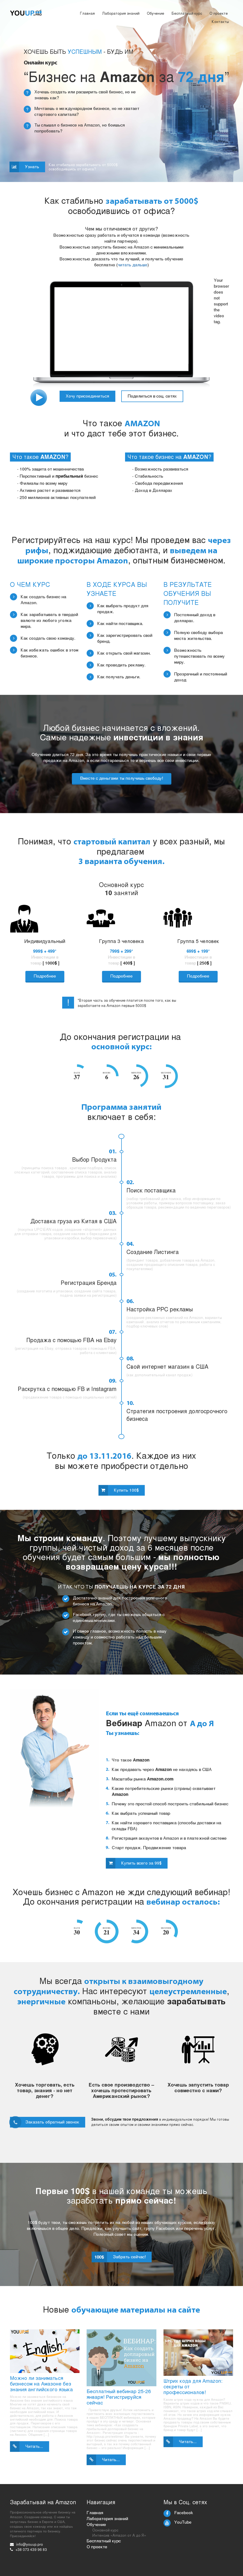 Купить русские прокси socks5 для facebook купити проксі